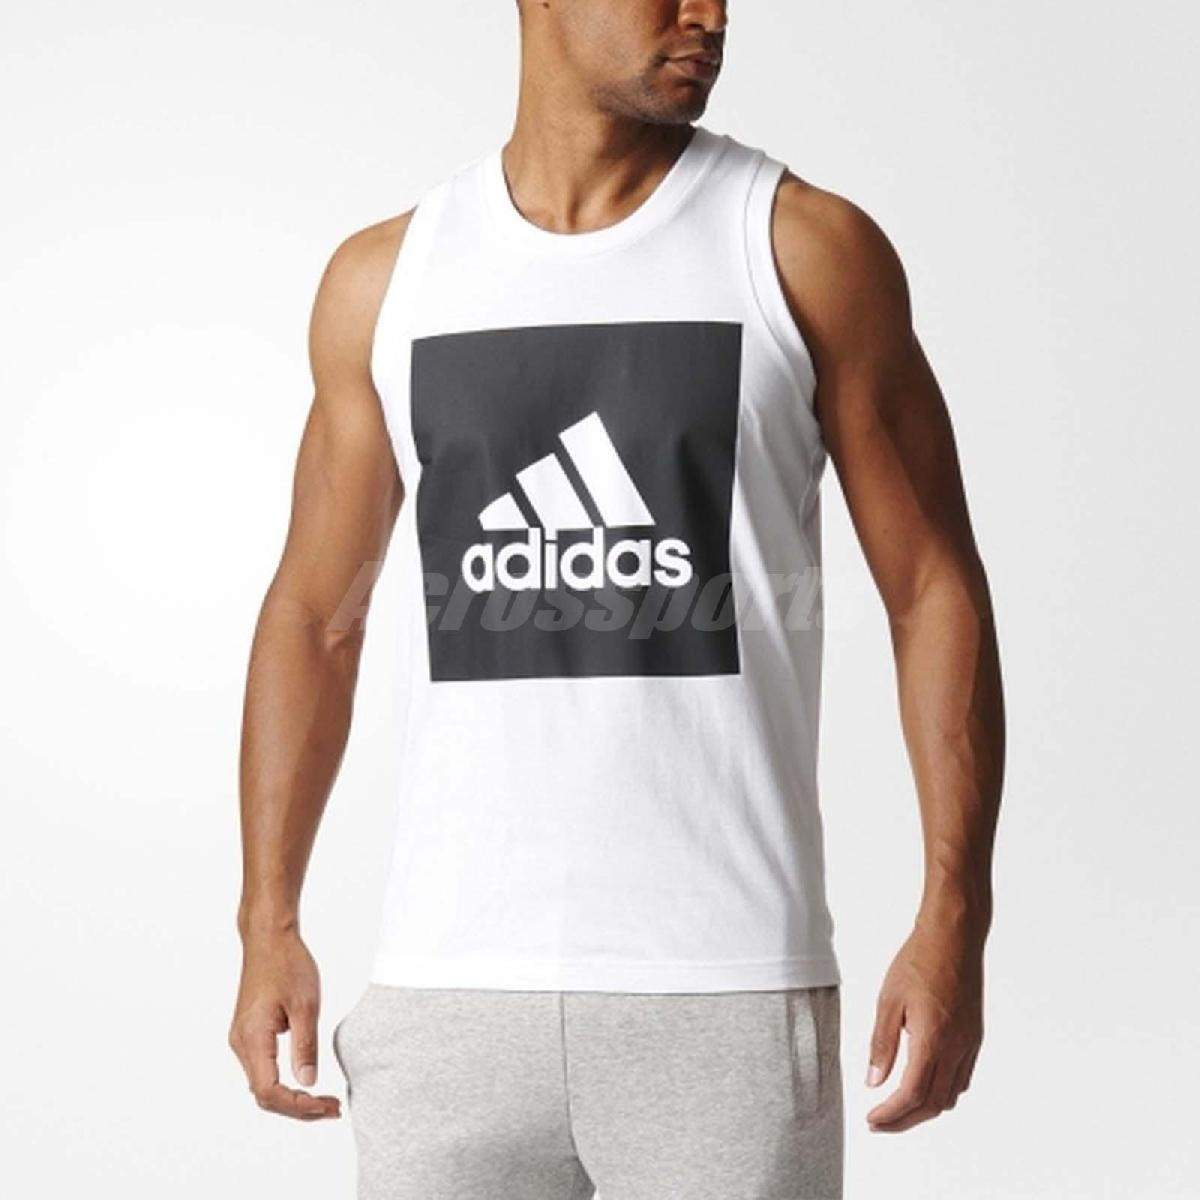 adidas背心ESSENTIAL TANK男款吊嘎無袖上衣三條線基本款訓練黑白黑白PUMP306 S98704